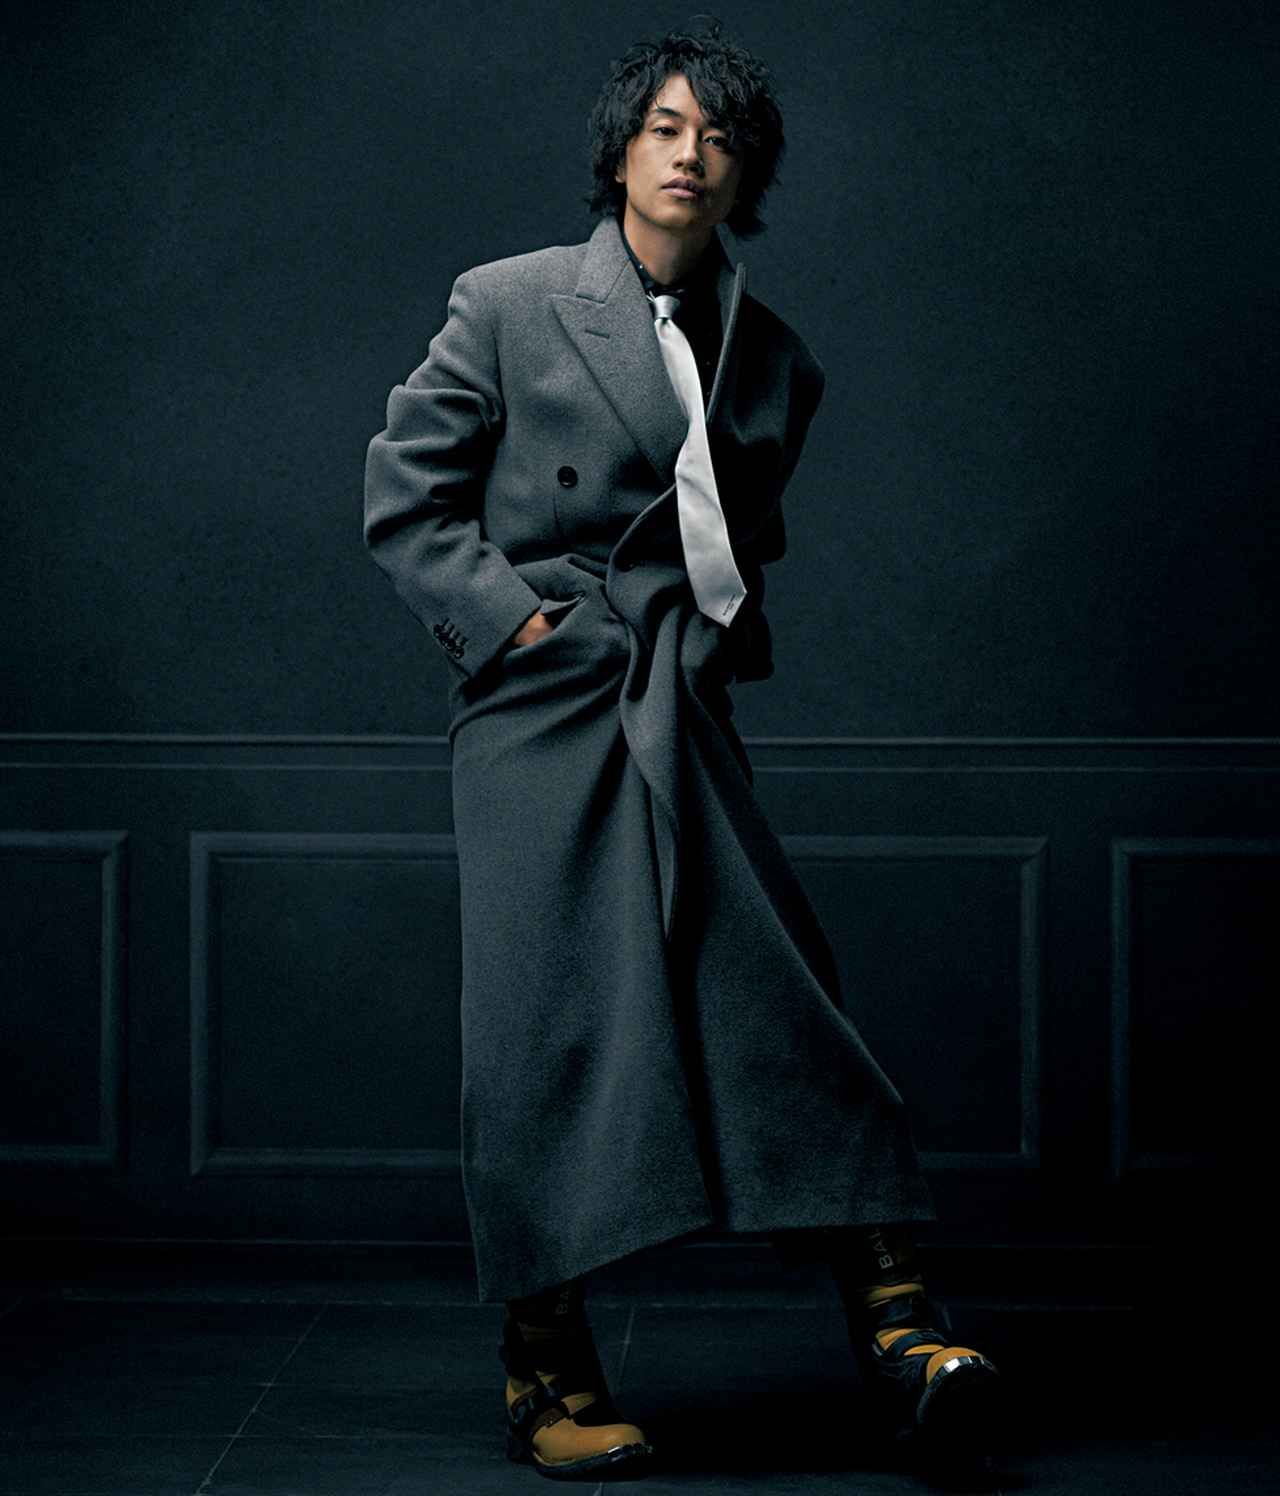 Images : 2番目の画像 - 「斎藤 工、かく纏いし」のアルバム - T JAPAN:The New York Times Style Magazine 公式サイト